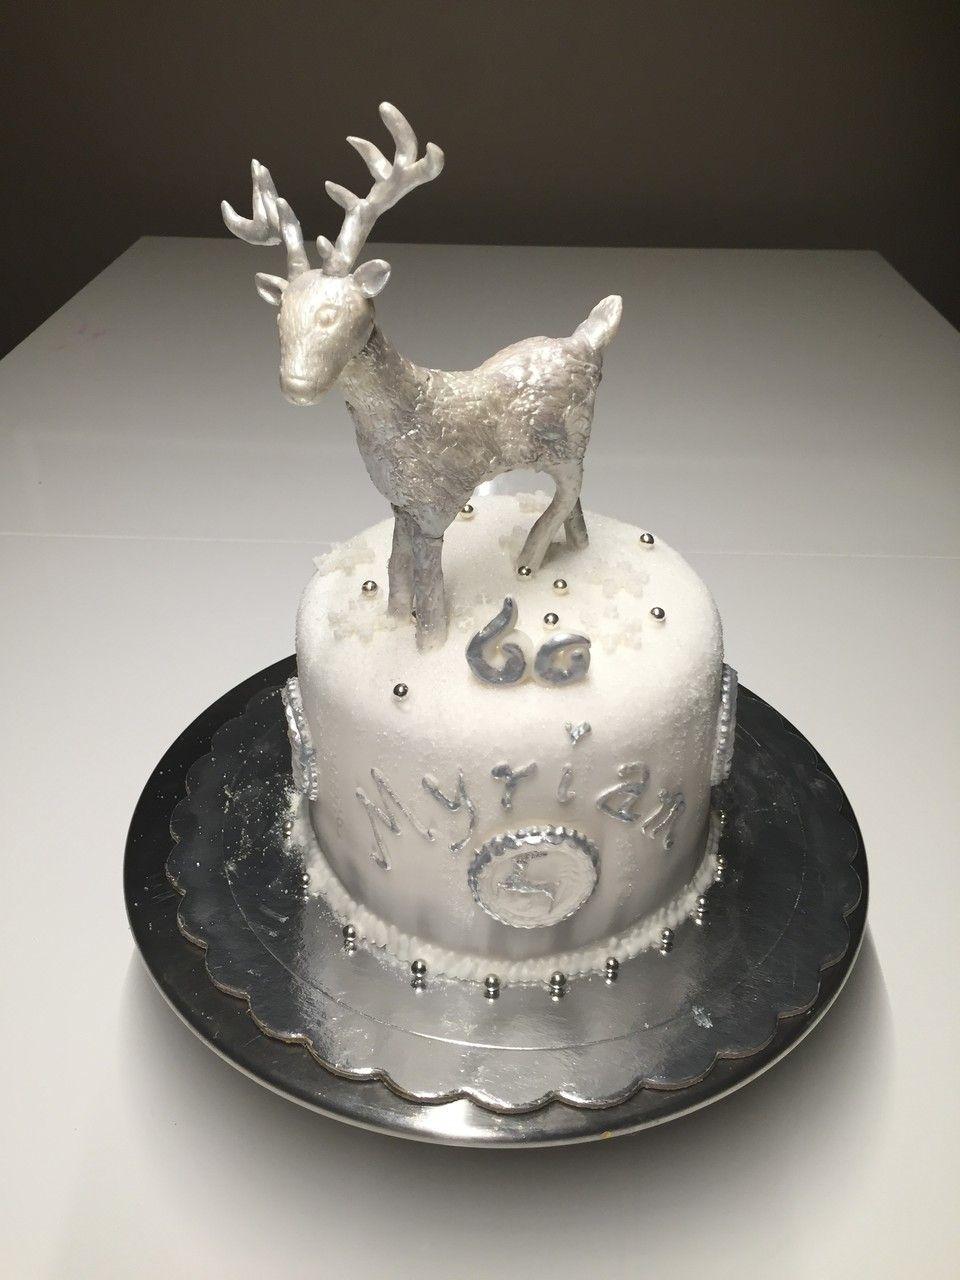 Gutschein Sweetycakes Sweetycakes Pinterest Birthday Cakes